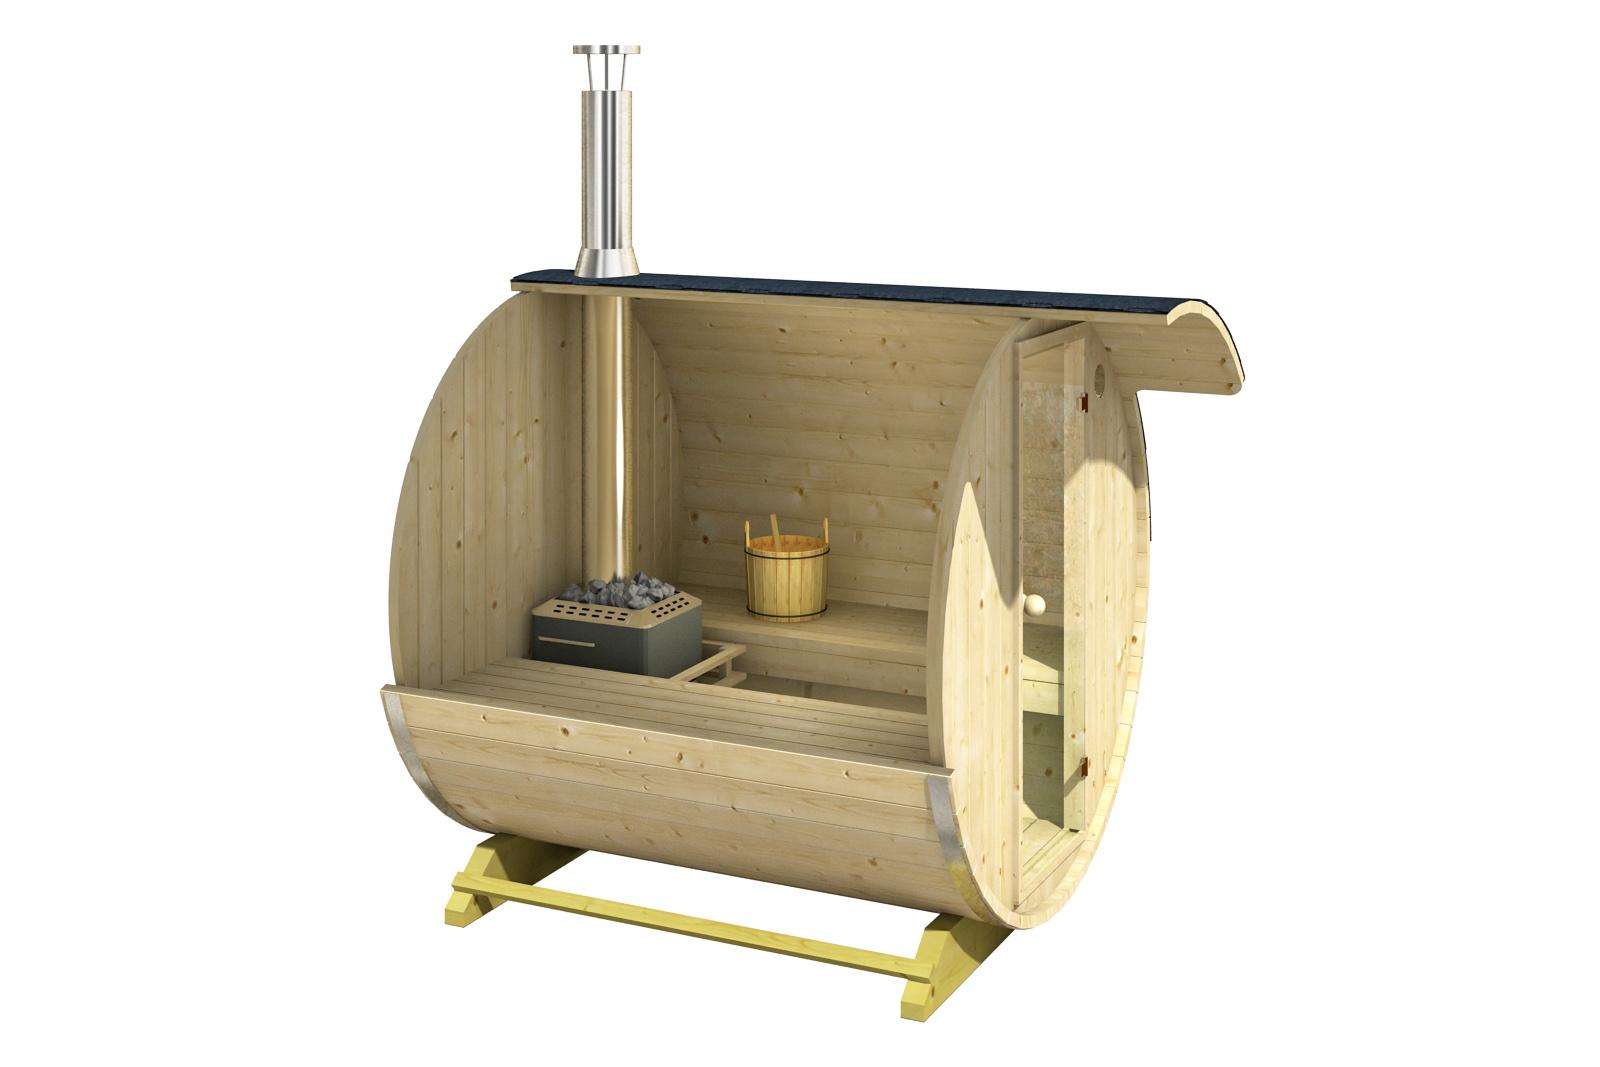 fass sauna modell tom mit harvia holz ofen fass sauna modell tom mit harvia holz ofen. Black Bedroom Furniture Sets. Home Design Ideas